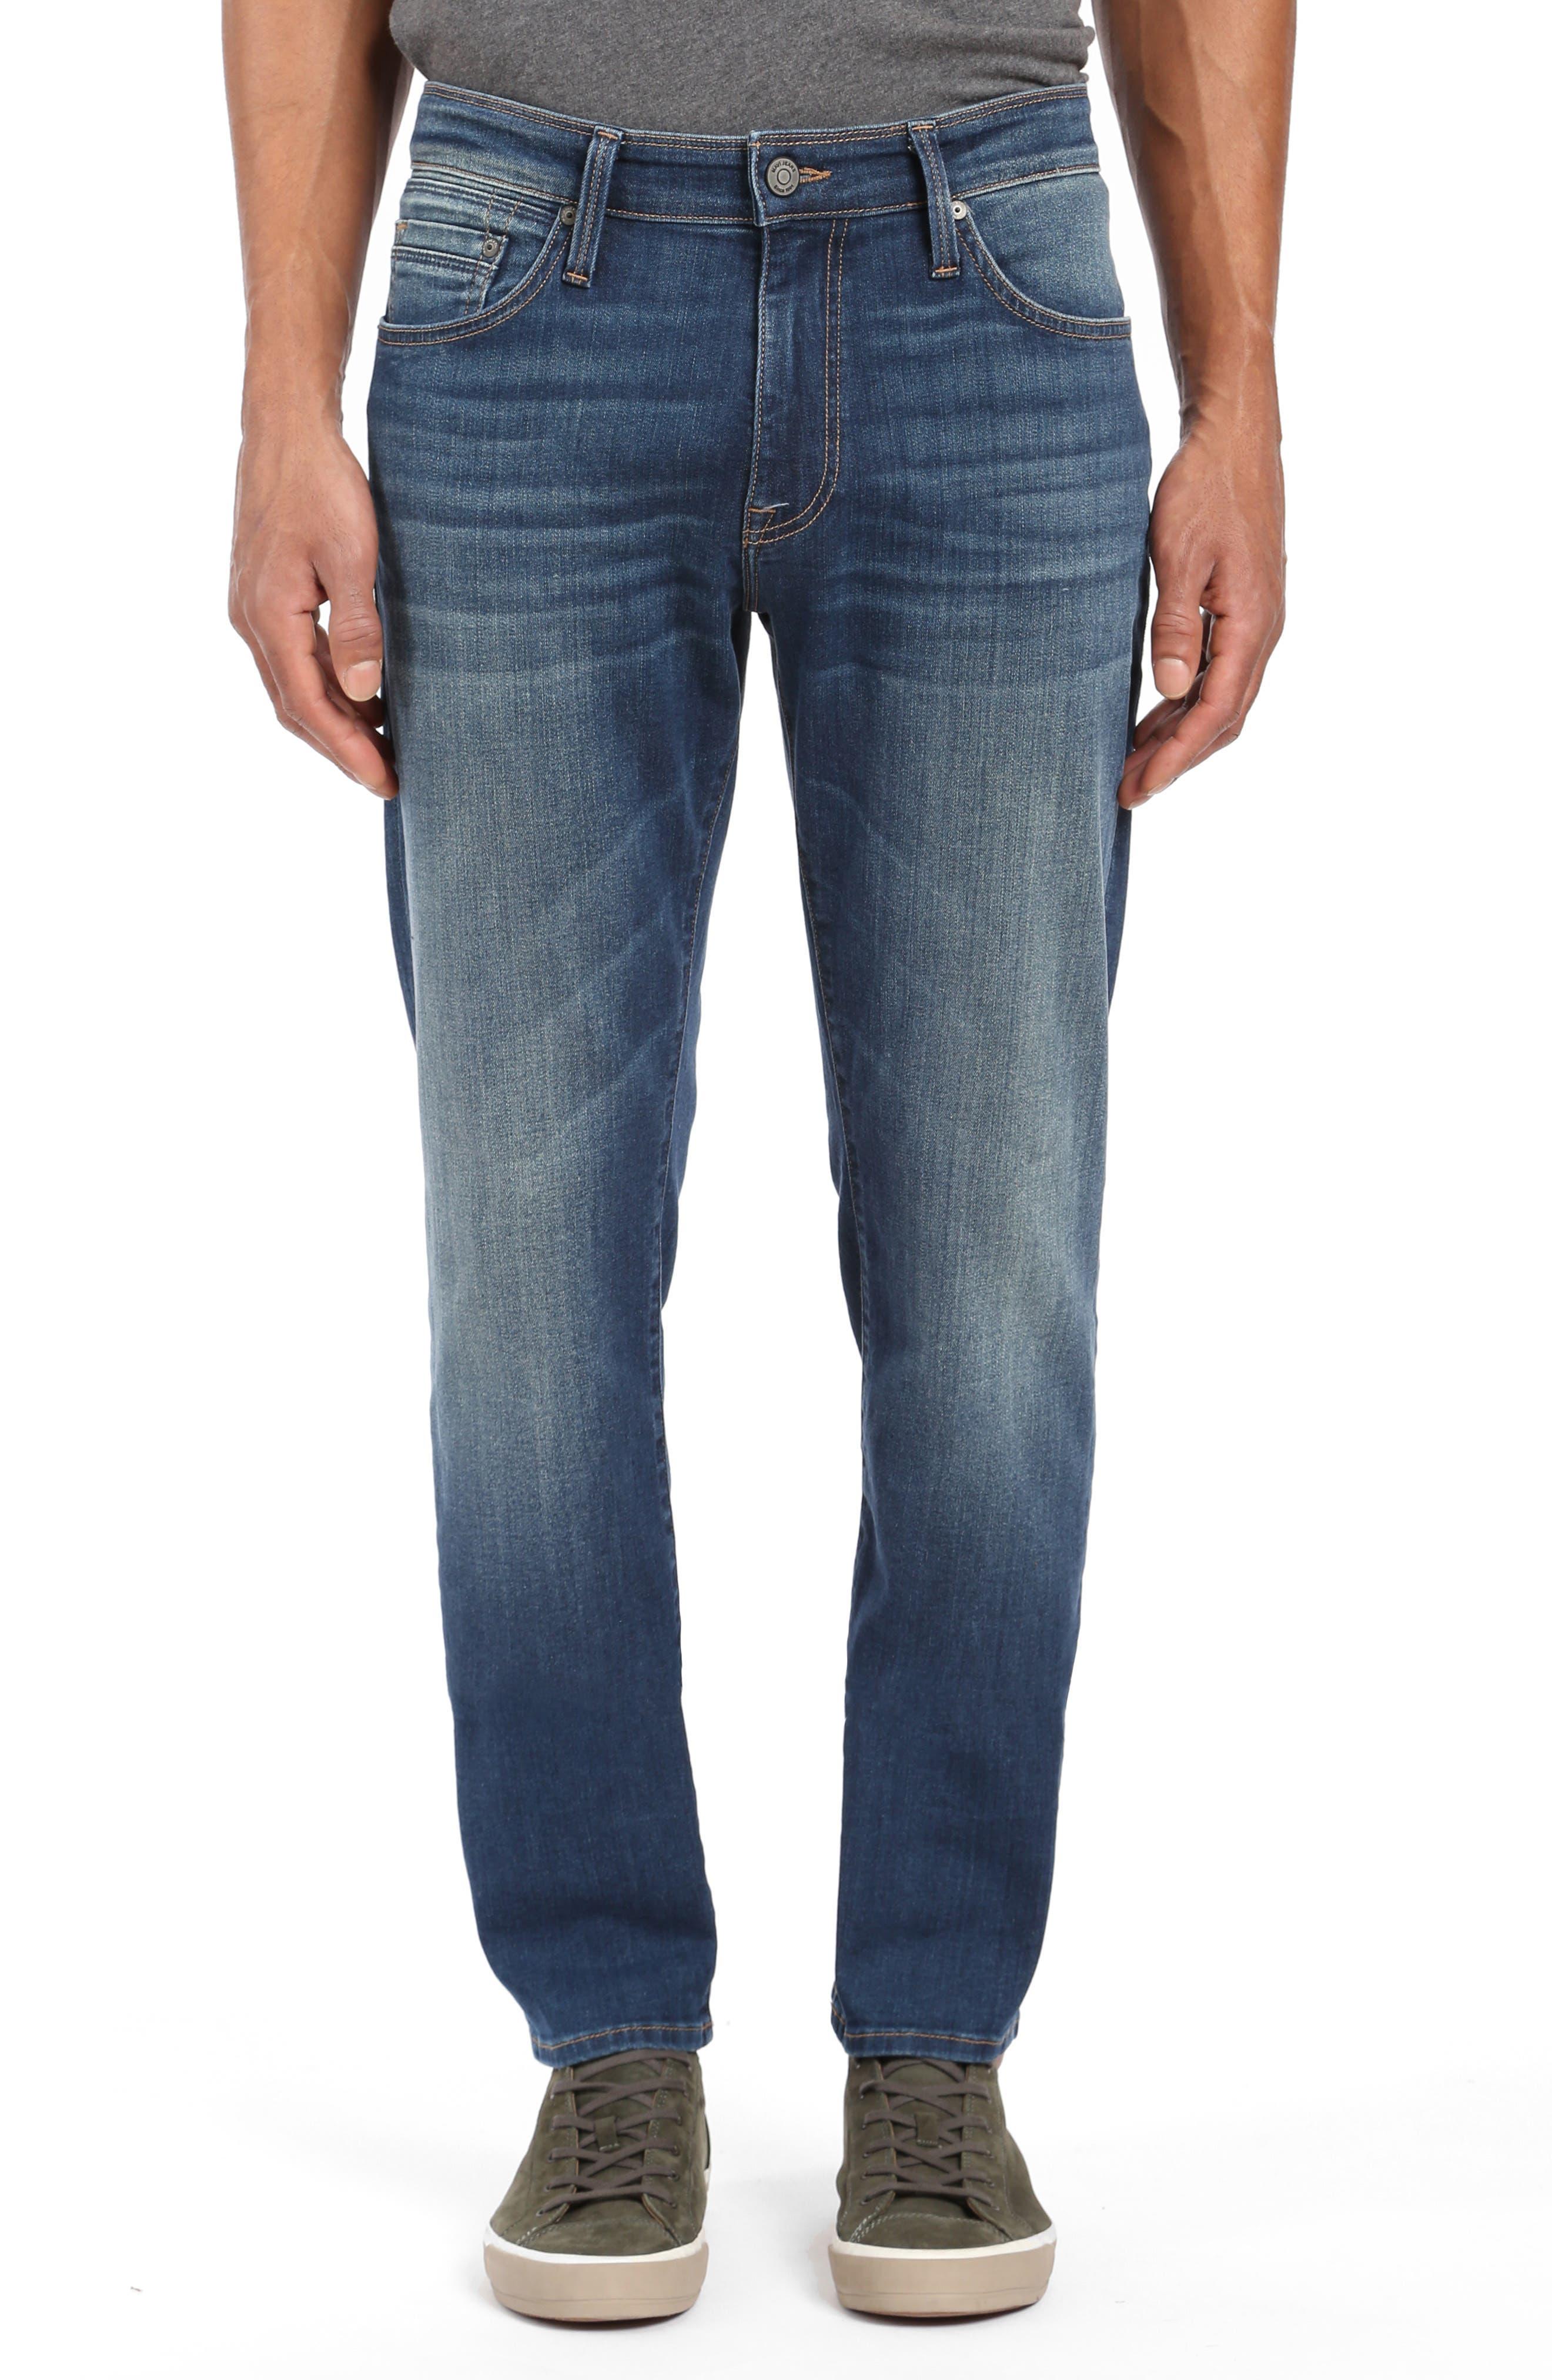 MAVI JEANS Marcus Slim Straight Leg Jeans in Mid Shaded Wiliamsburg